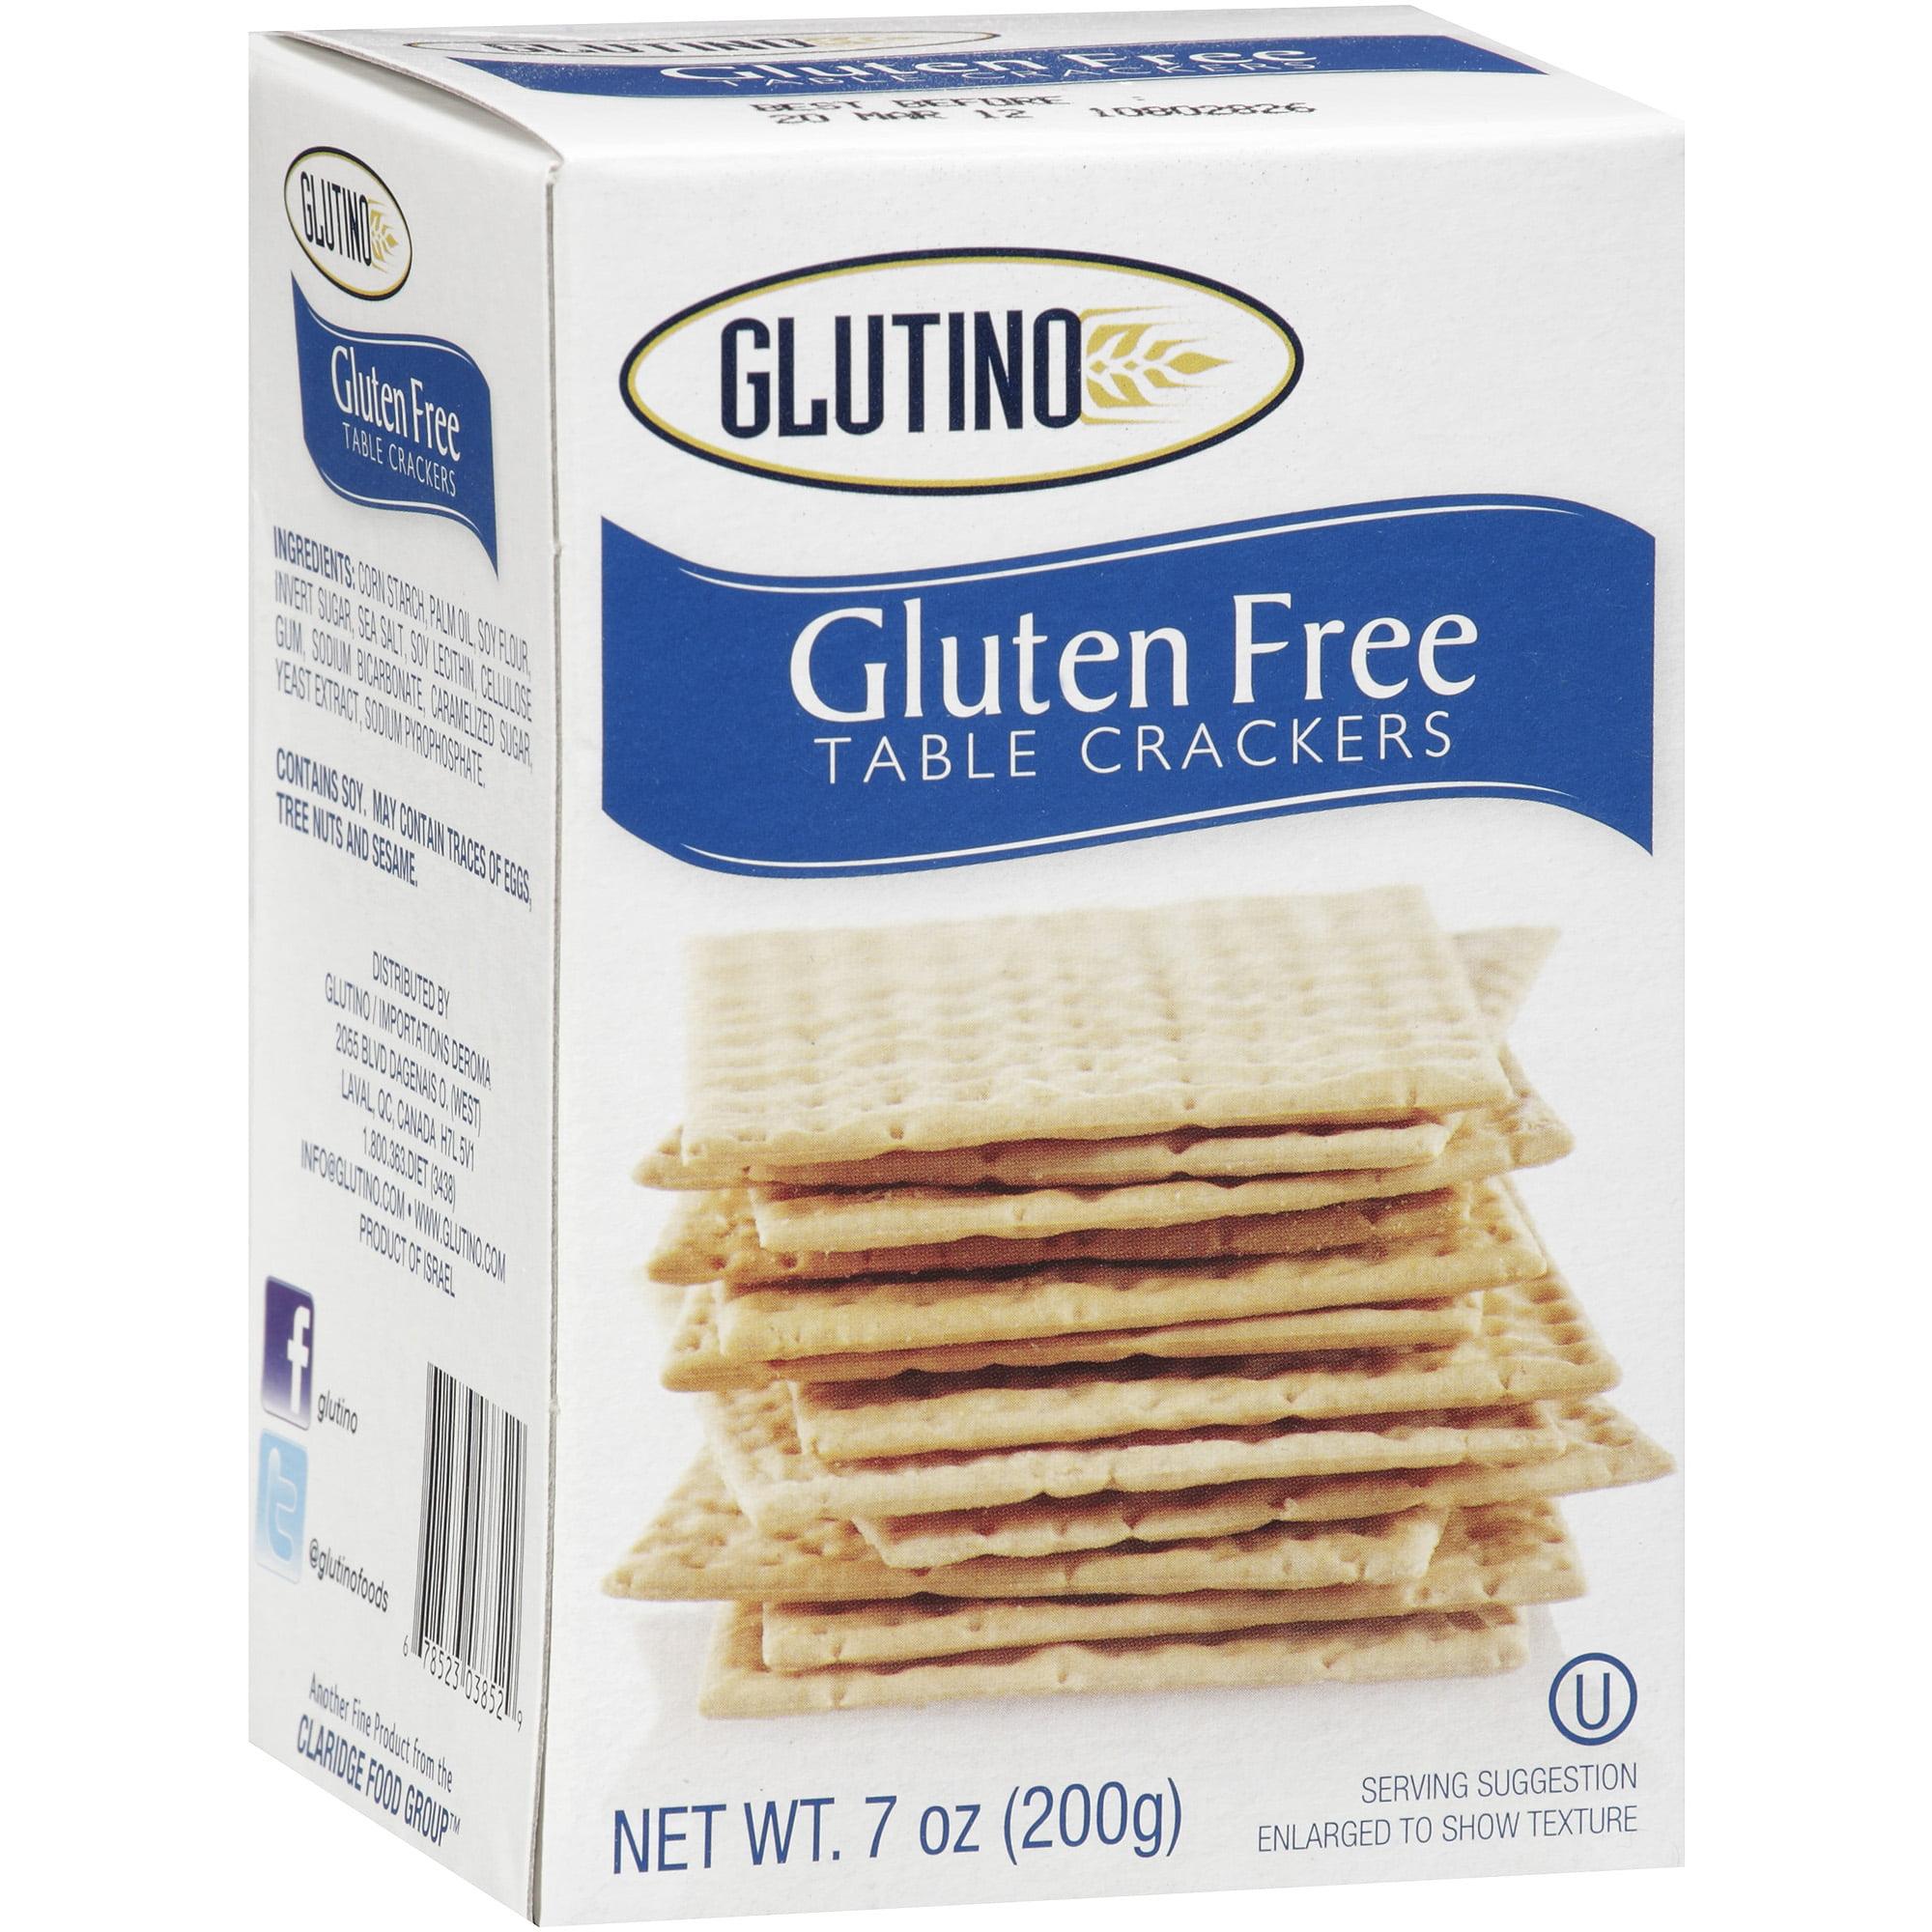 (2 Pack) Glutino® Gluten Free Original Table Crackers 7 oz. Box